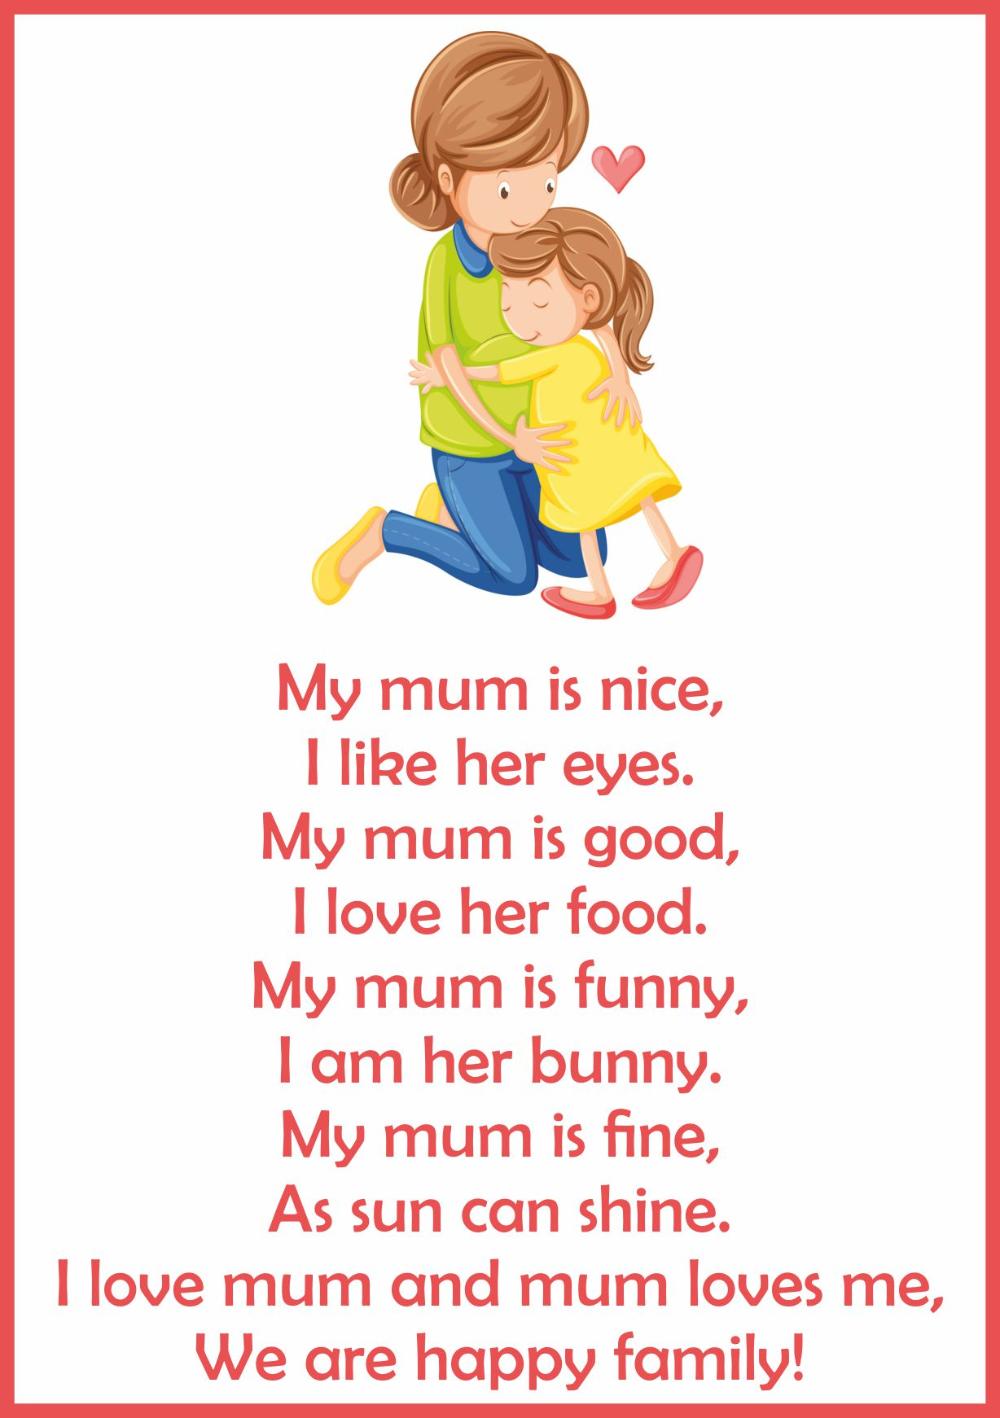 FAVE ENGLISH POSTERS: учебные плакаты